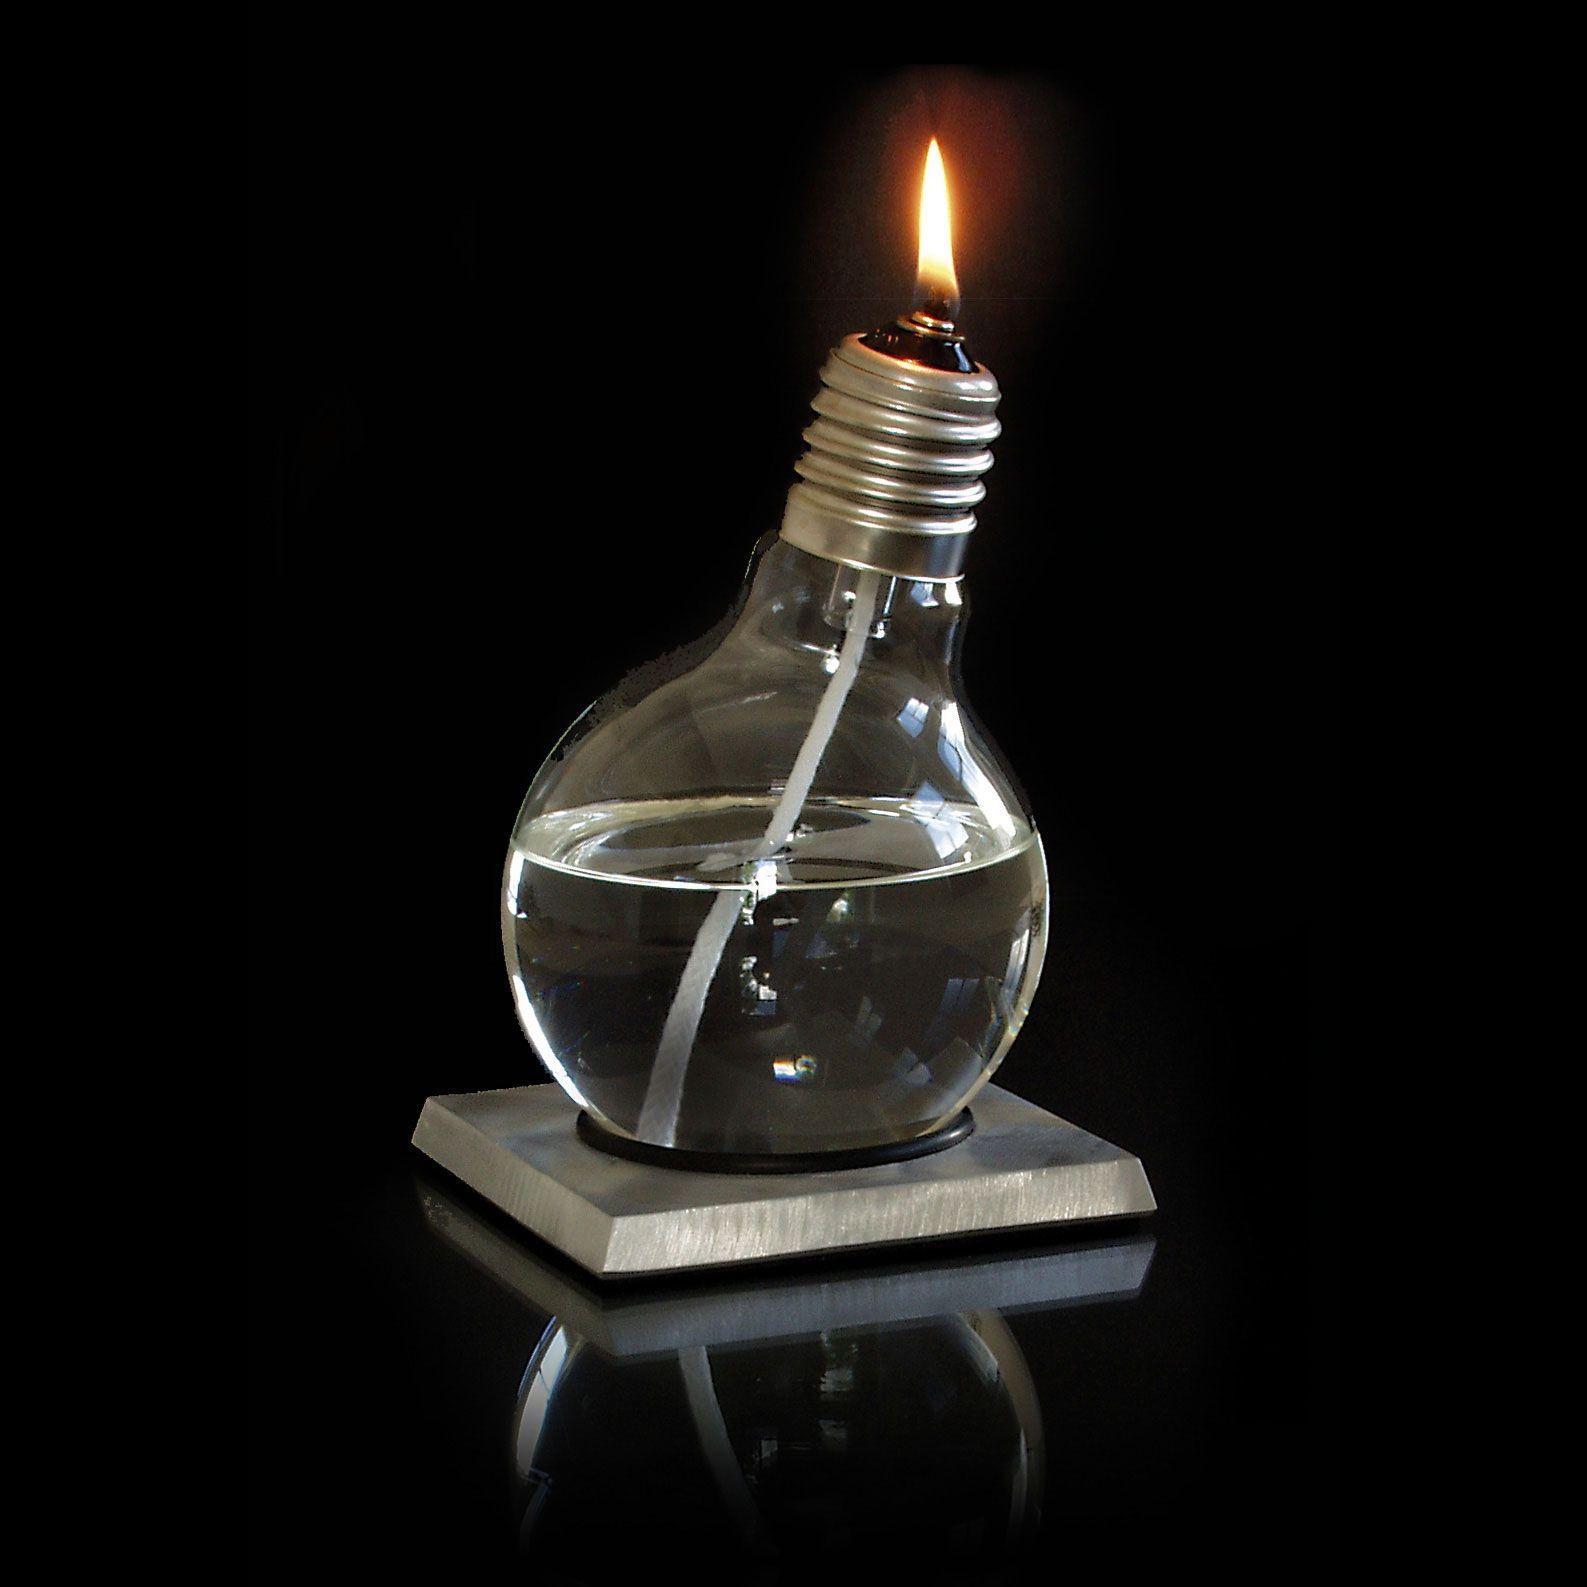 lampe à huile image